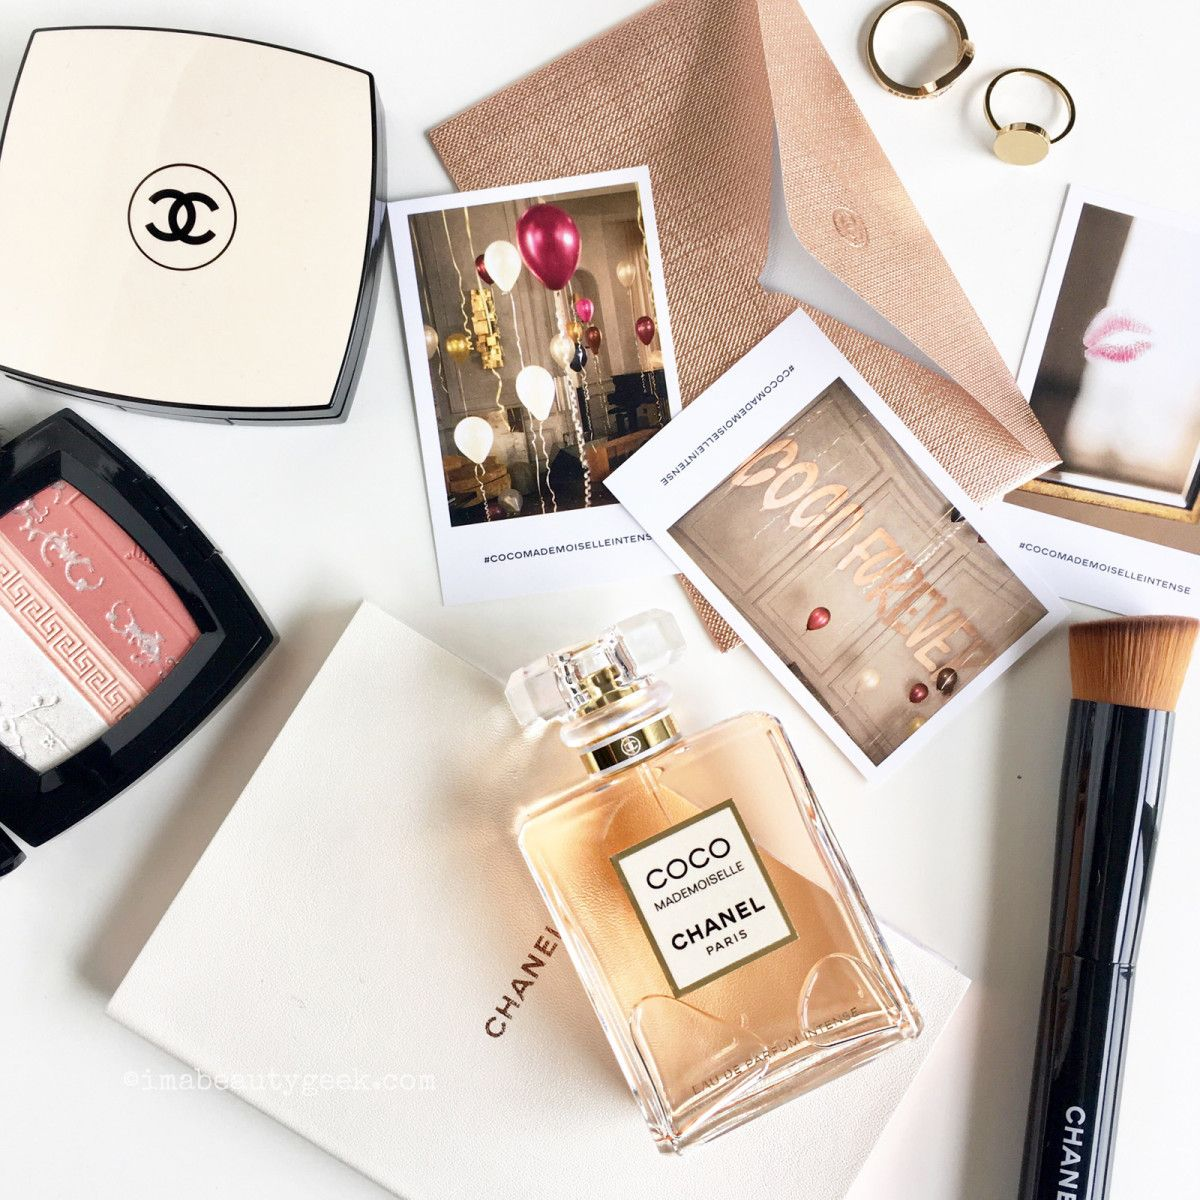 Chanel Coco Mademoiselle Edp Intense в 2019 г наша шафа Coco